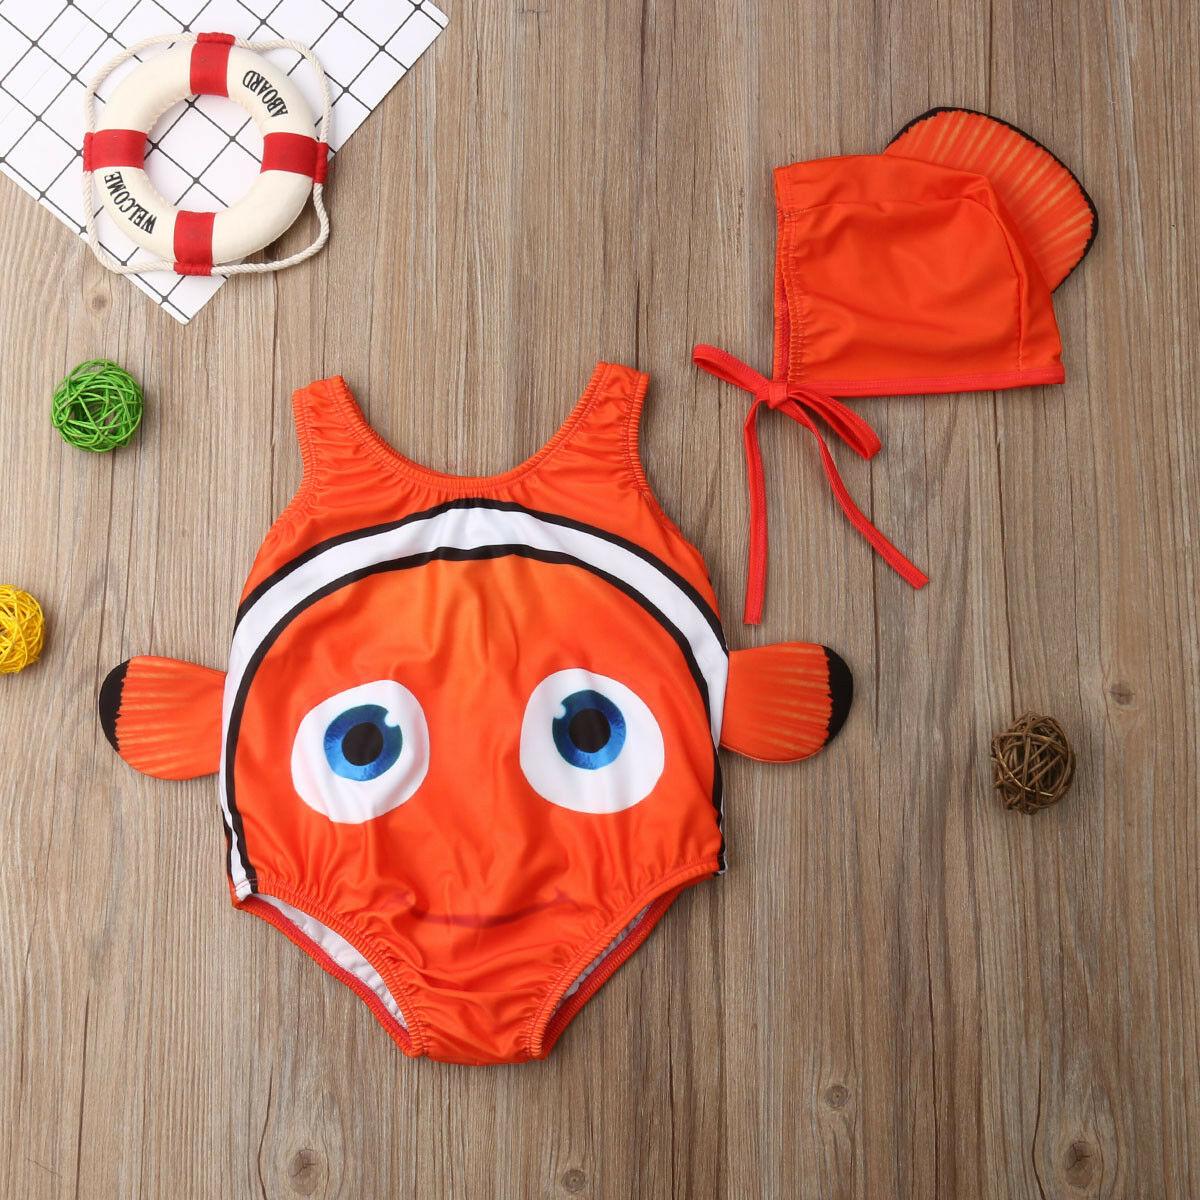 Hot 2Pcs Kids Baby Girl Swimsuit Goldfish Swimwear Swimmable Bikini Beach Print Cute Sweet Costume+Swimming Hat Bathing Suit